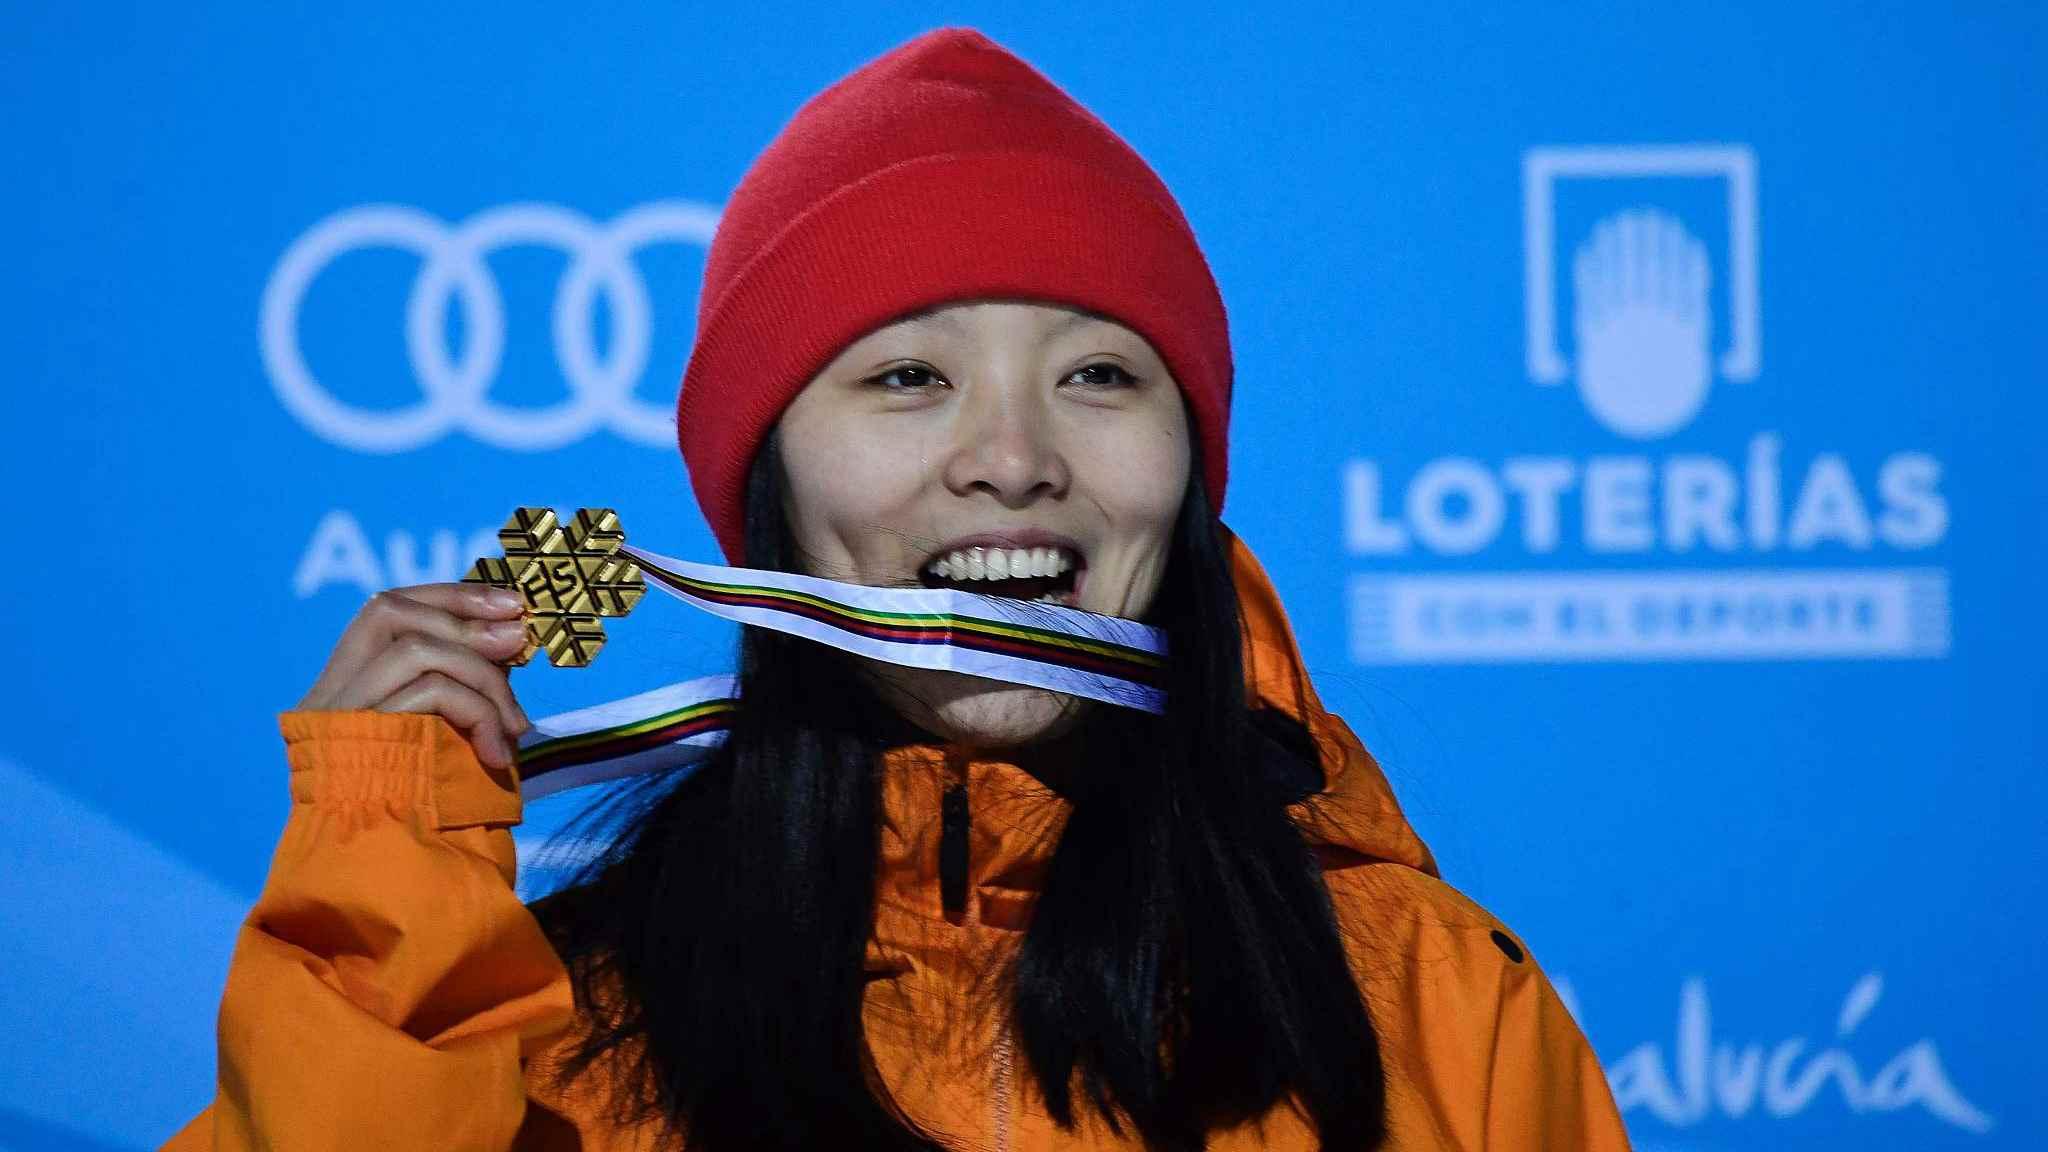 World Champion Cai Xuetong wins half-pipe World Cup